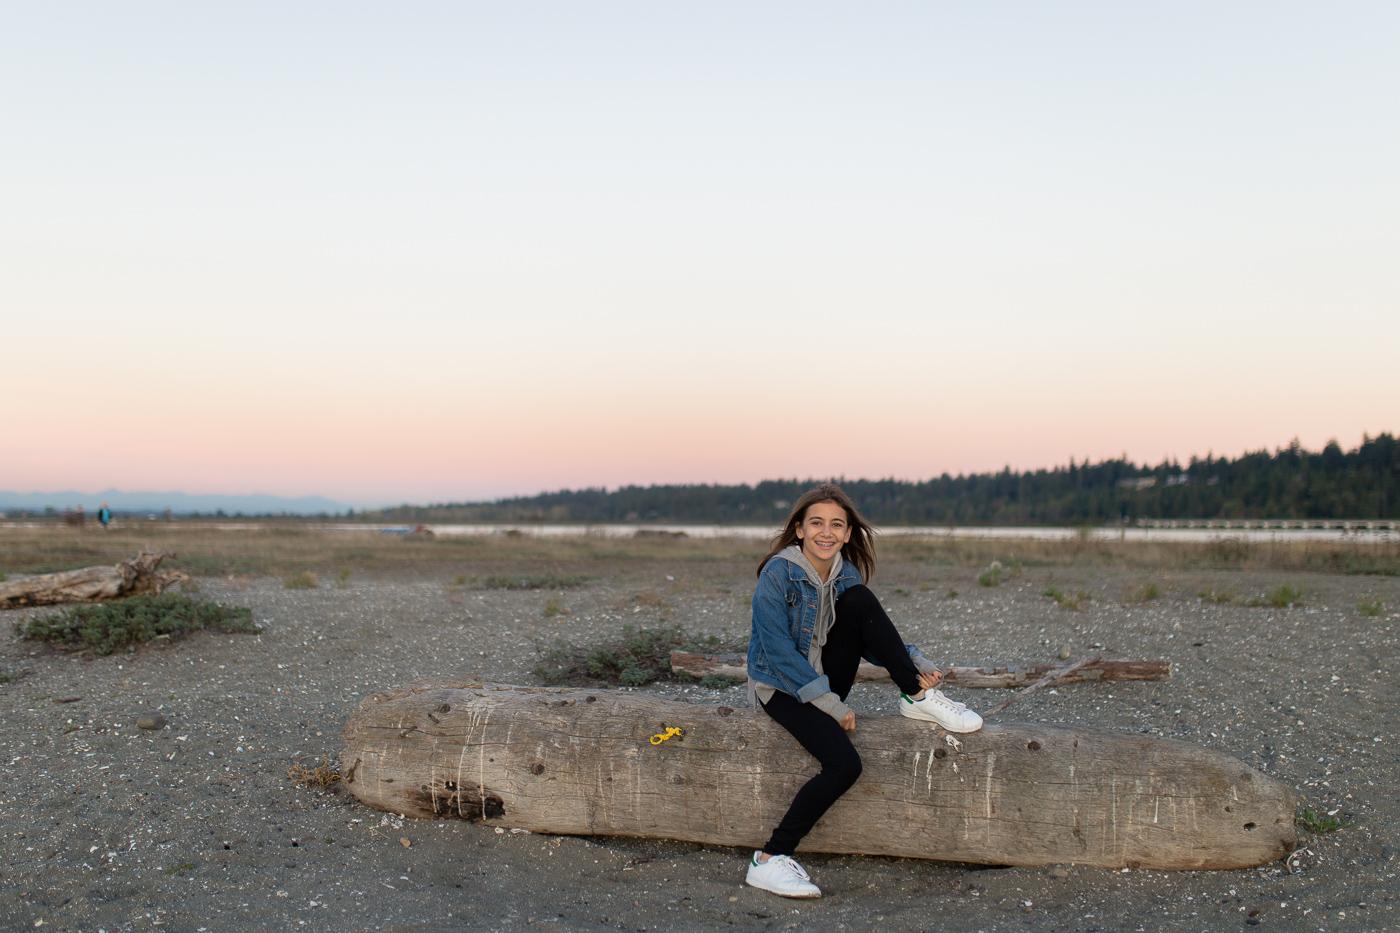 Crescent Beach Photographer